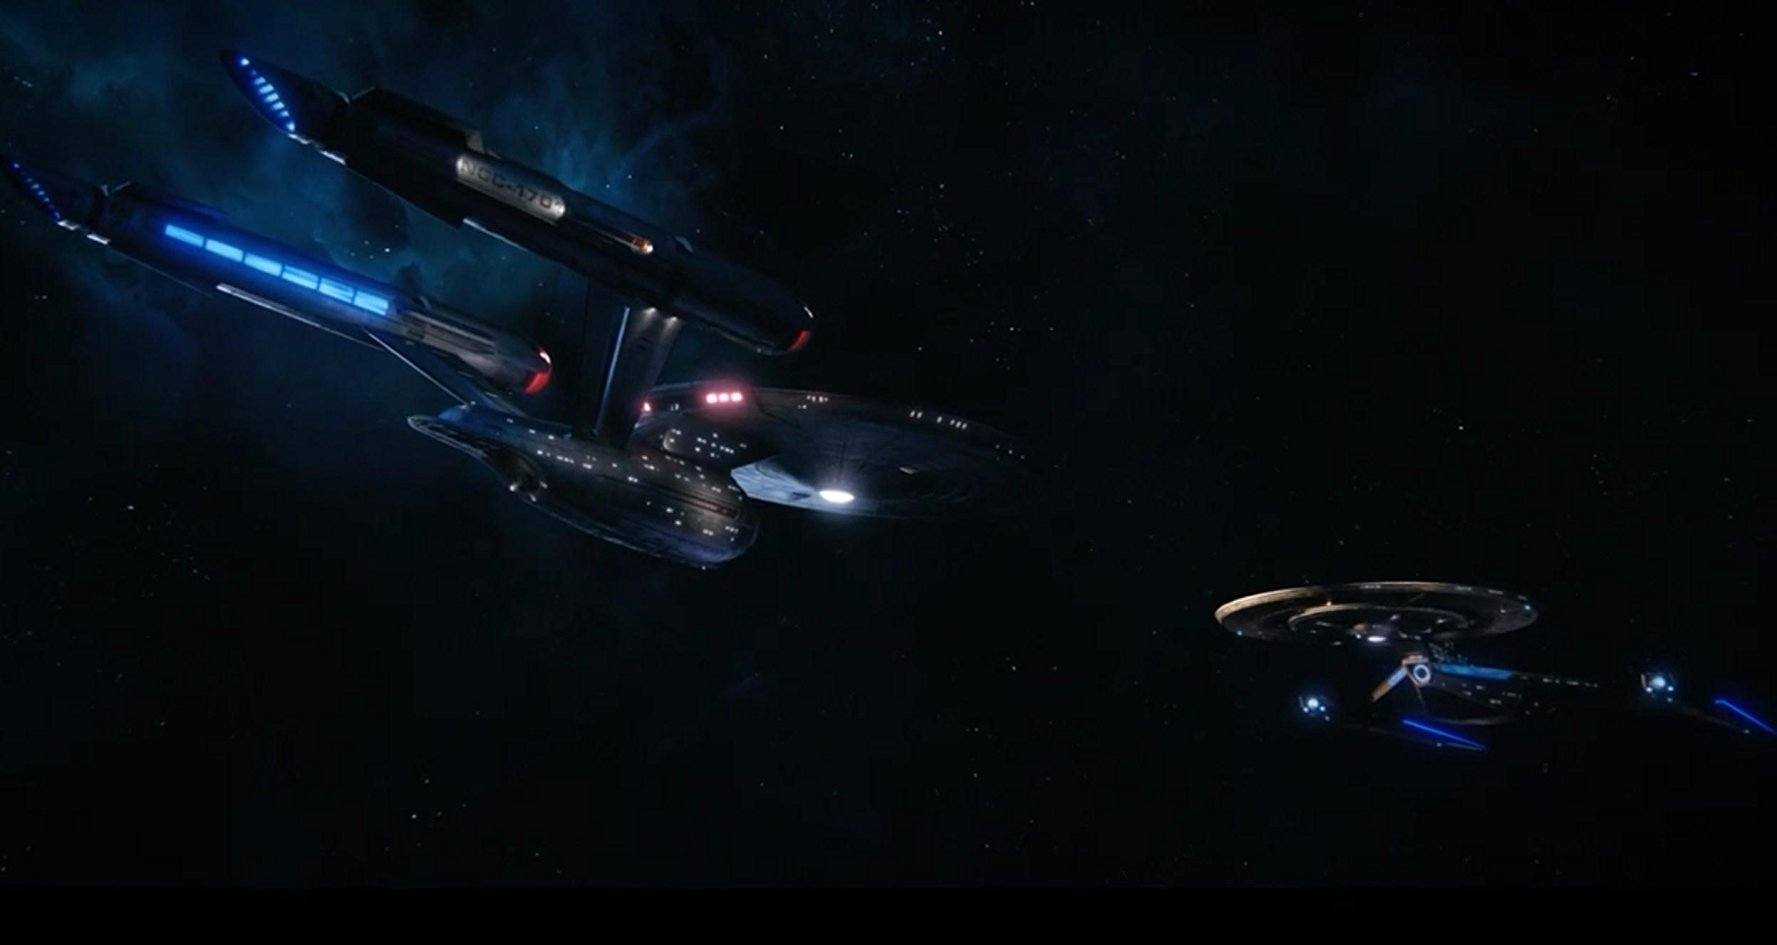 The USS Enterprise on Star Trek: Discovery